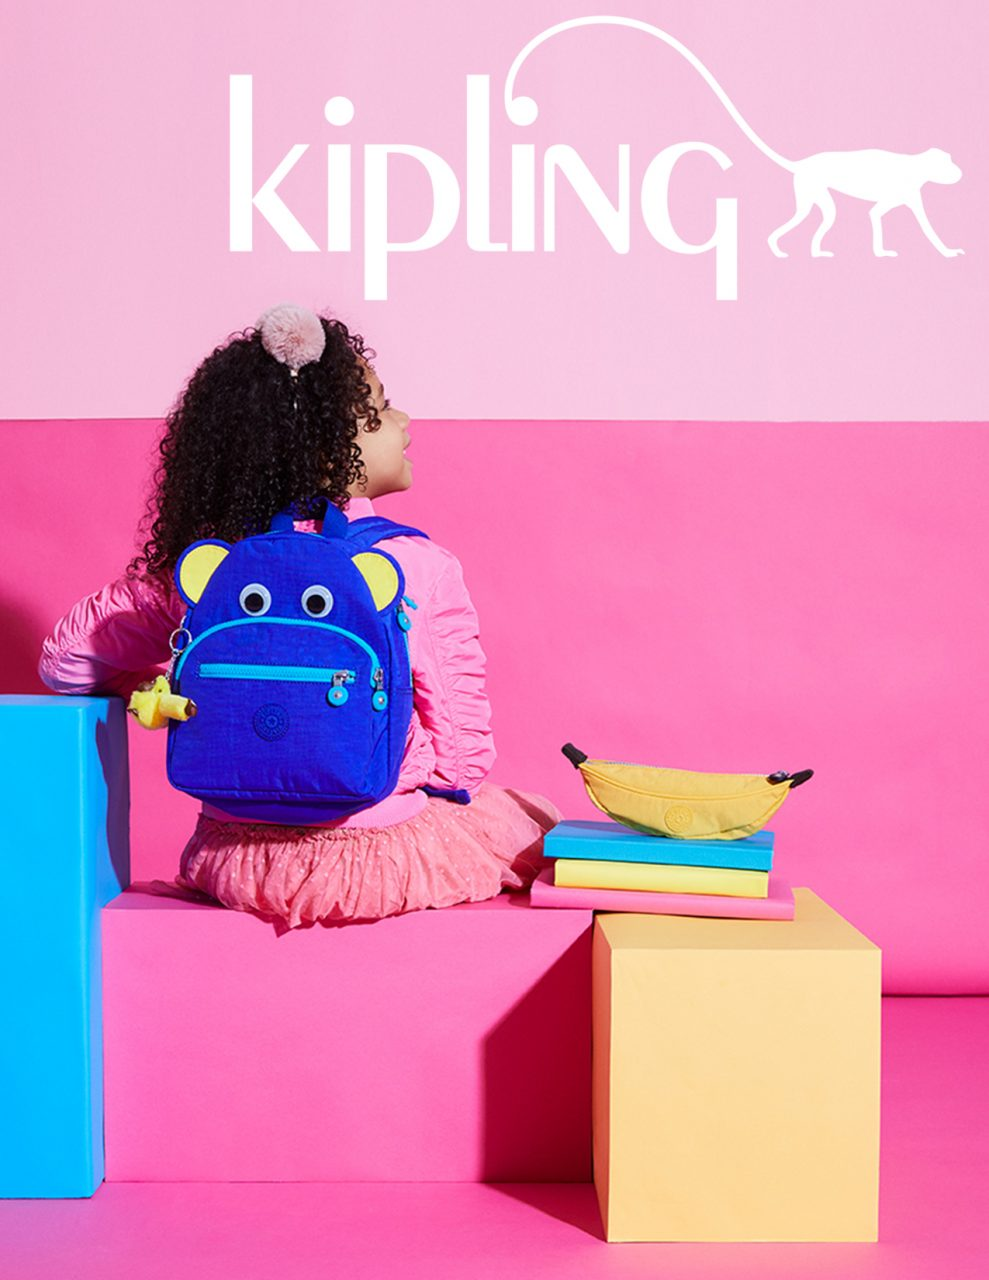 Kipling Final 3